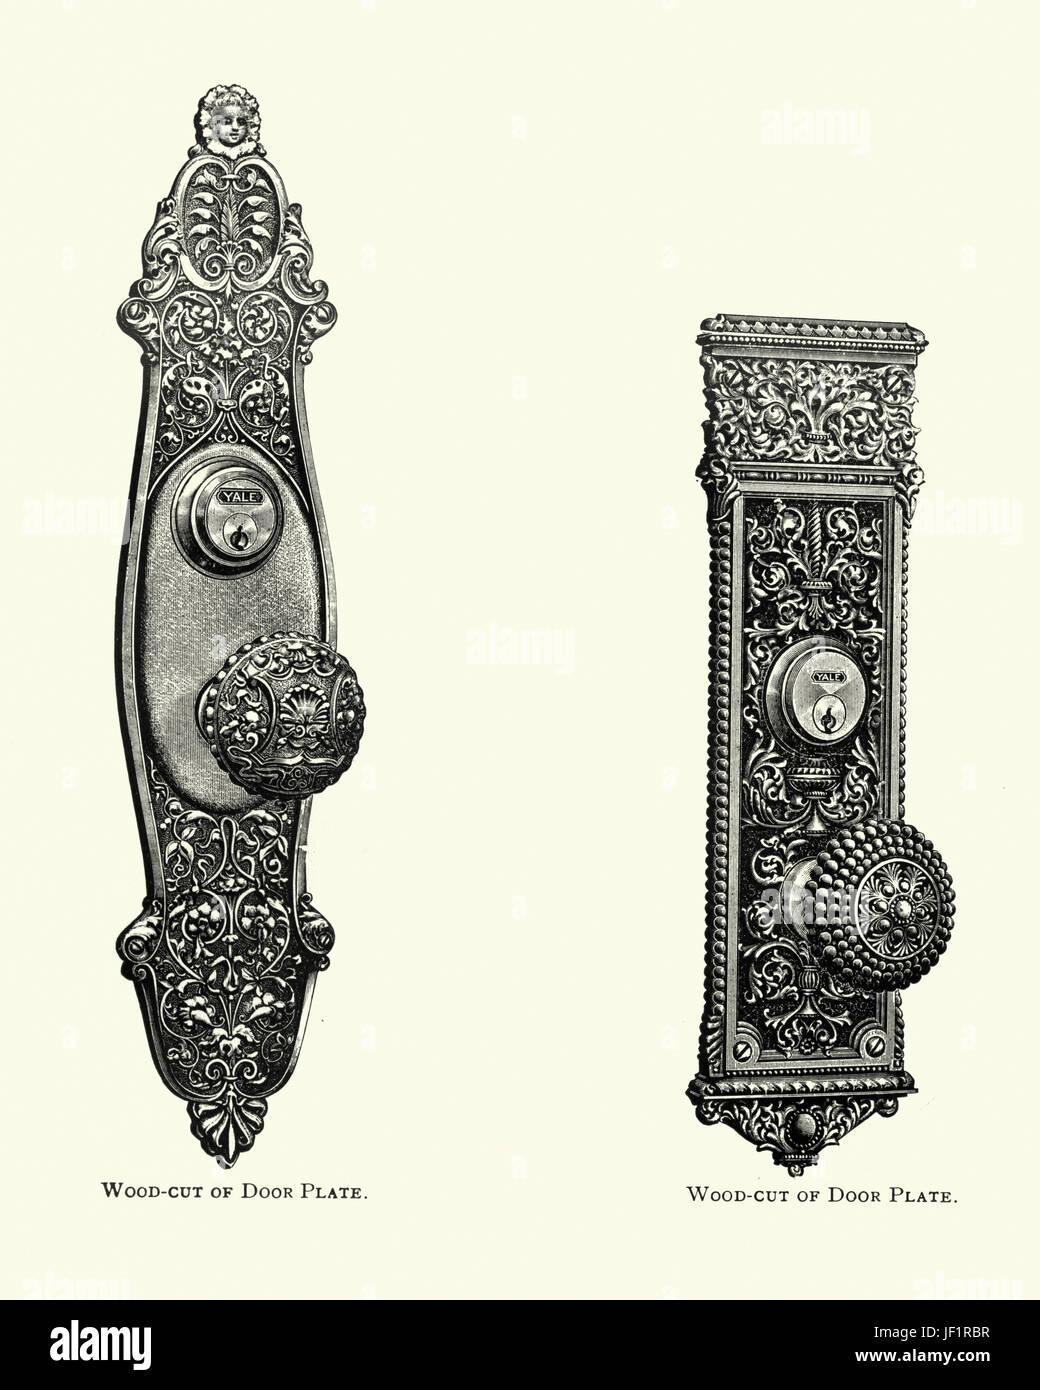 Edwardian decor, door plates, c. 1913 - Stock Image